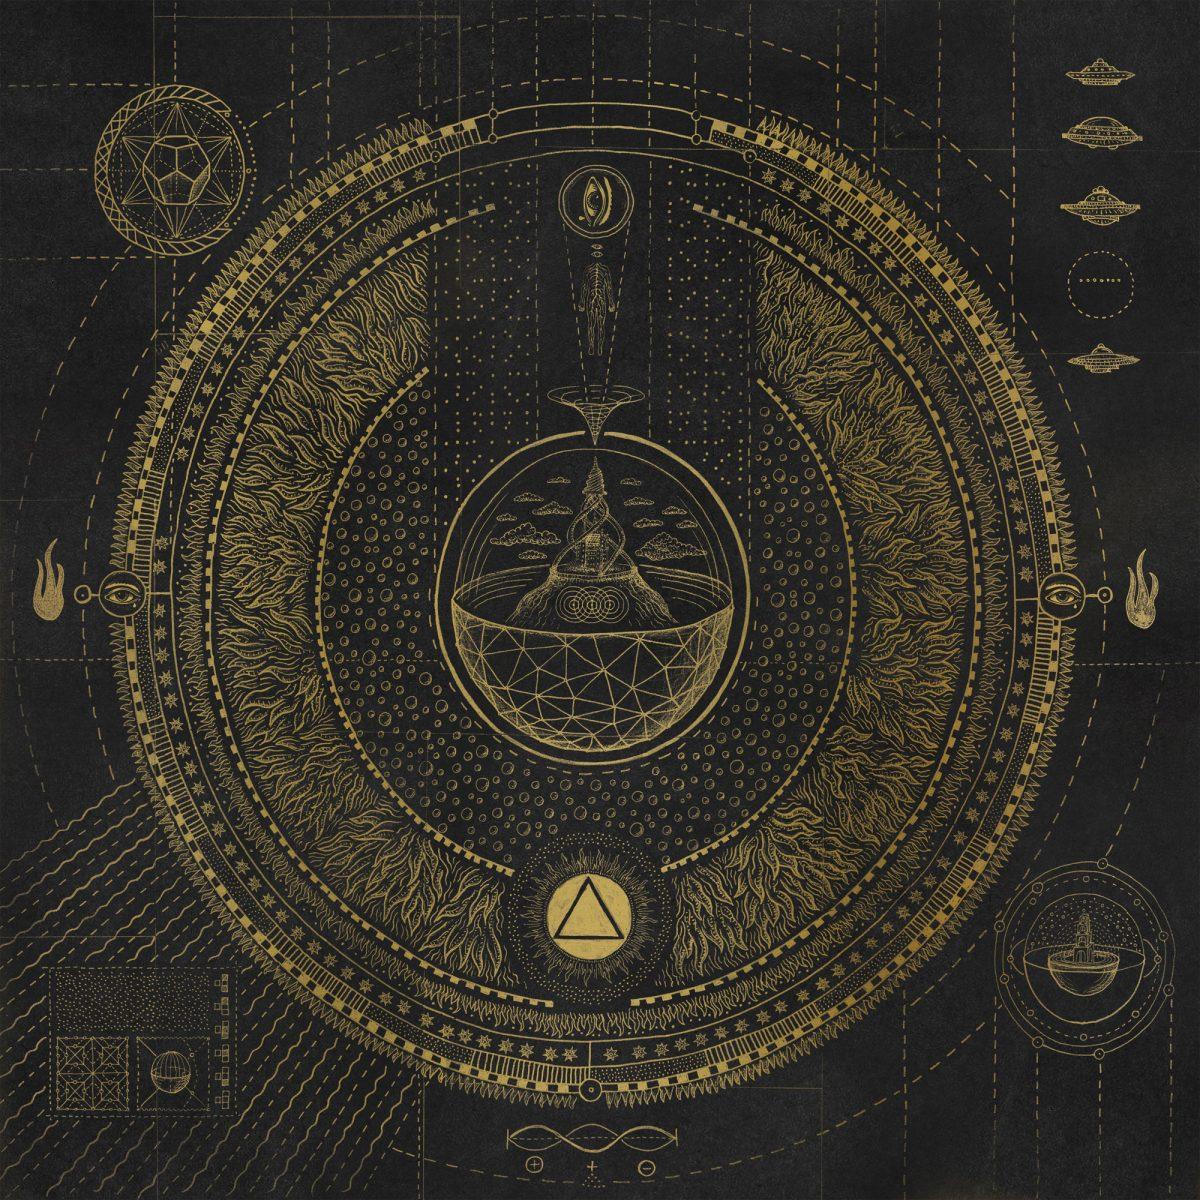 xixa-genesis-album-review